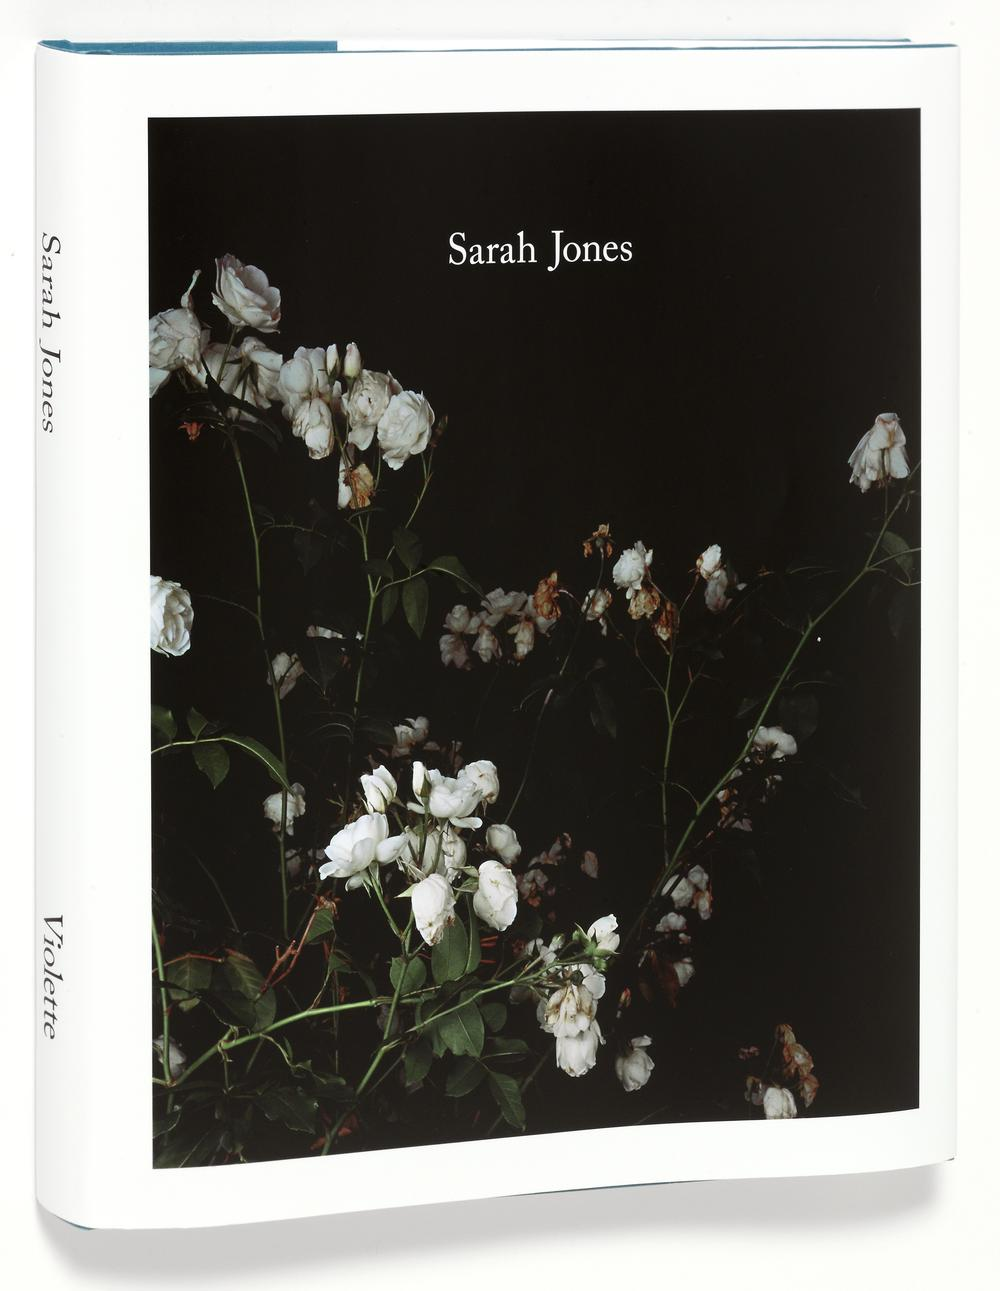 Sarah Jones (book cover: London: Violette Editions, 2013)